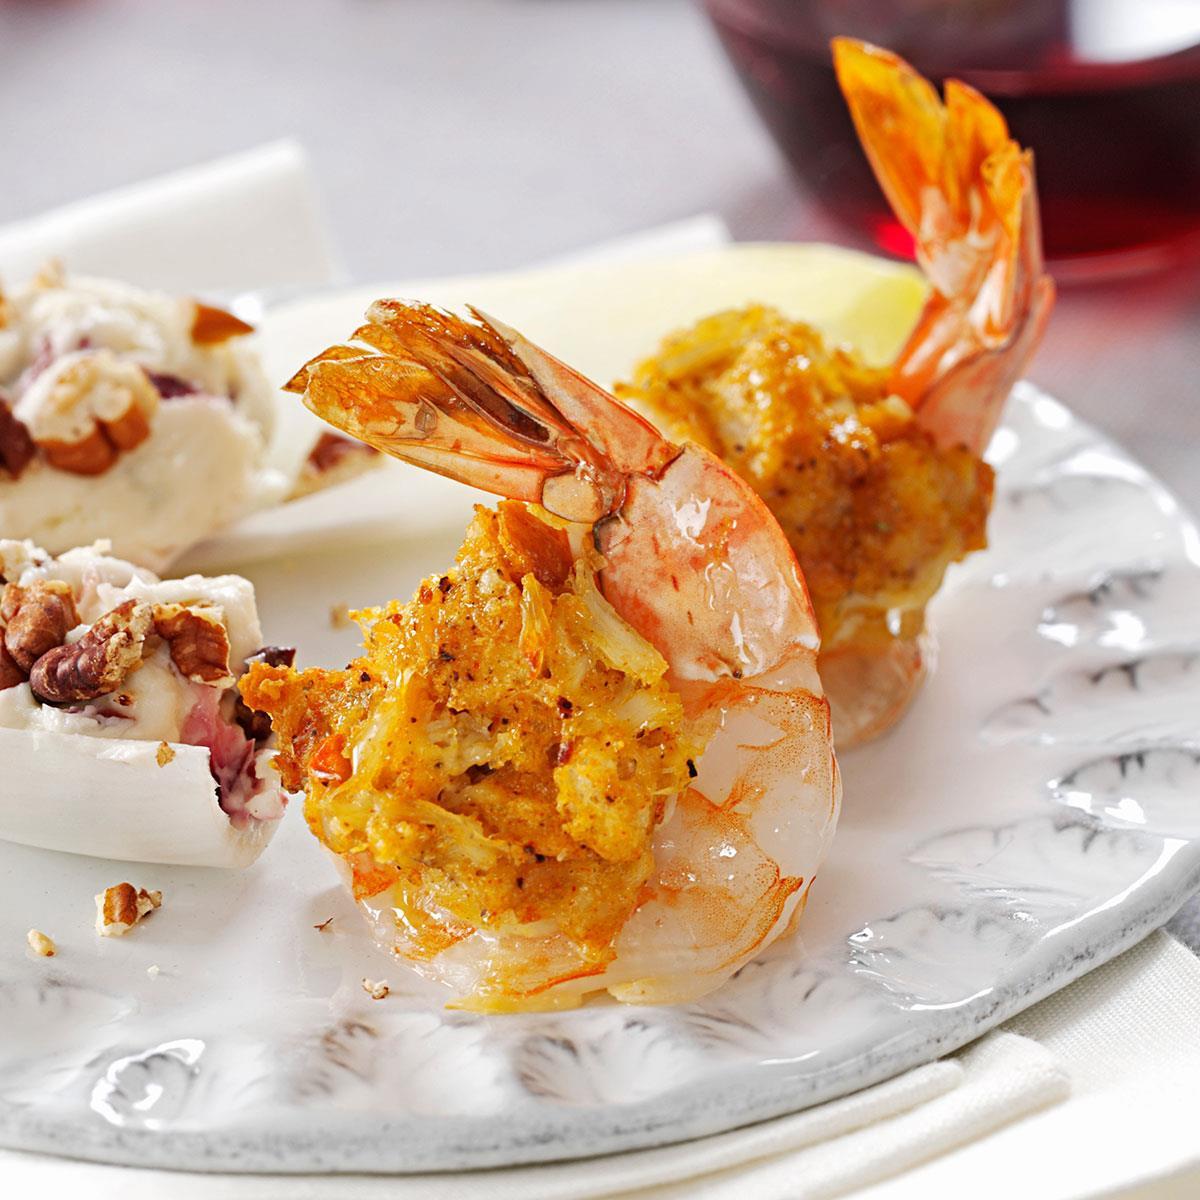 Shrimp Appetizer Recipes  Stuffed Shrimp Appetizers Recipe